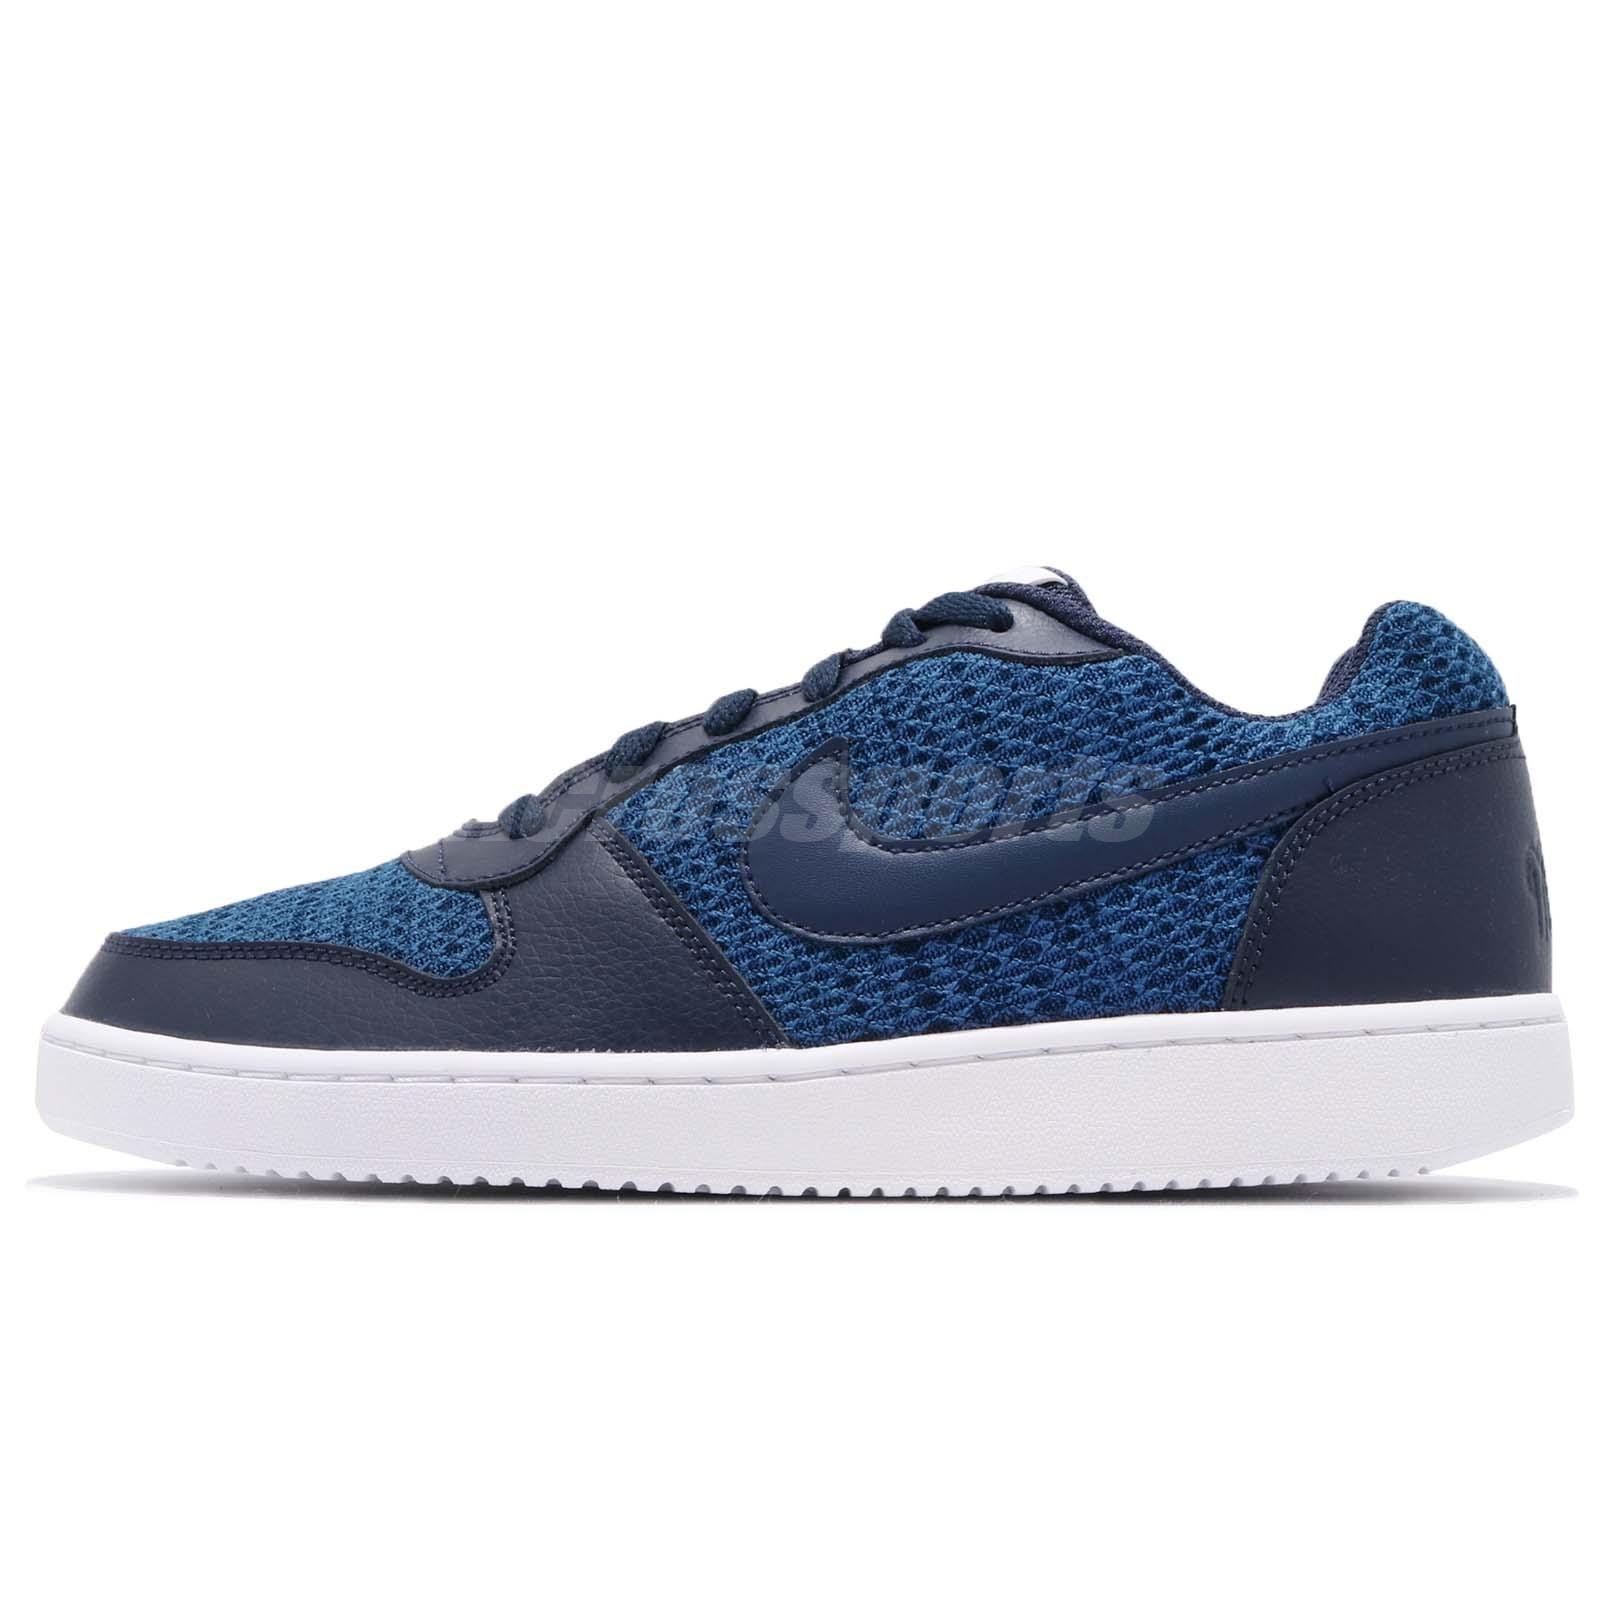 info for 0f2f2 378bc Nike Ebernon Low PREM Premium Blue Navy White Men Casual Shoe Sneaker AQ1774 -440